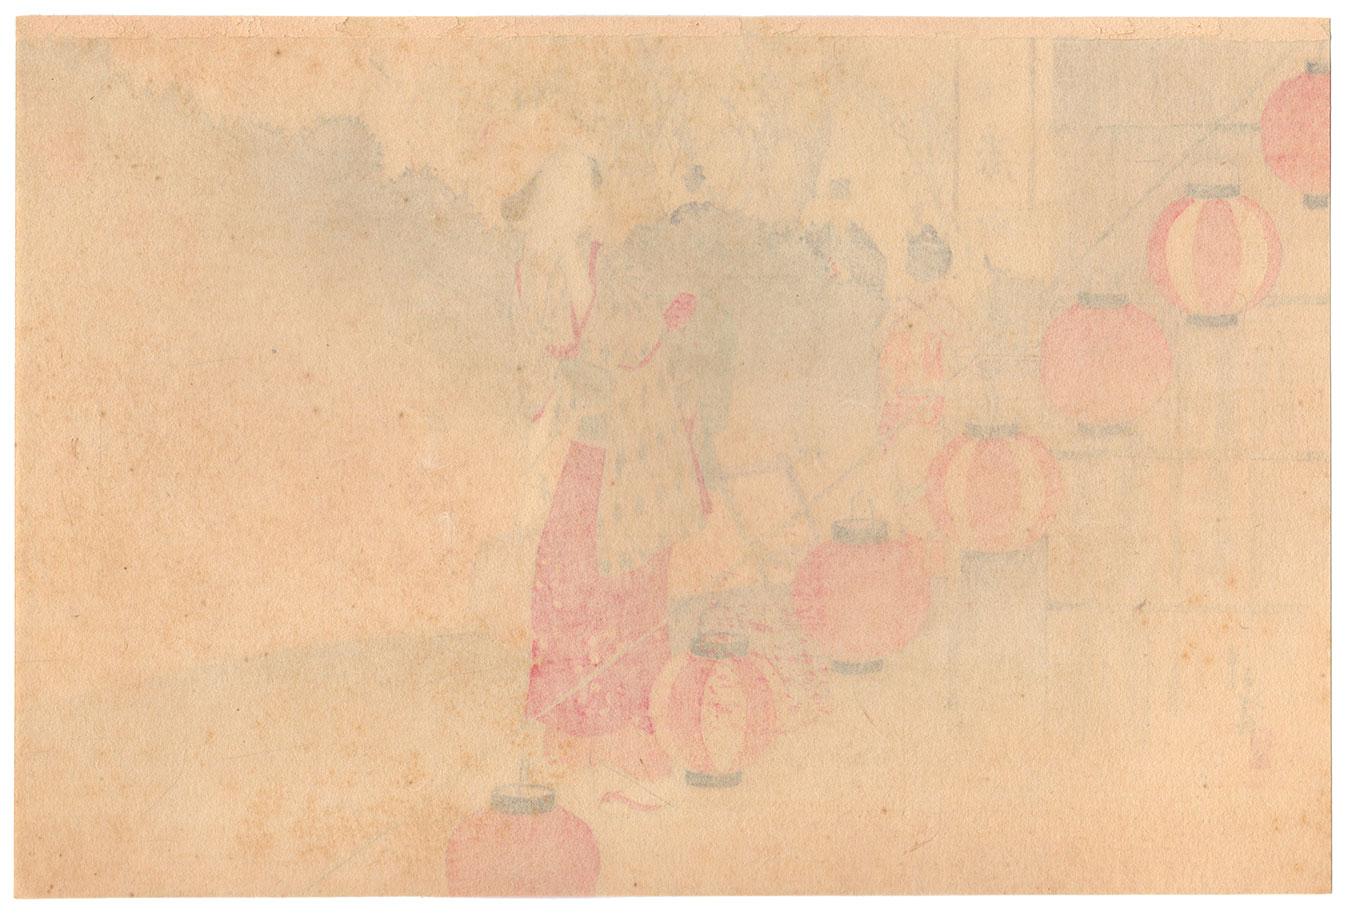 Party Cabin Original Woodblock Print